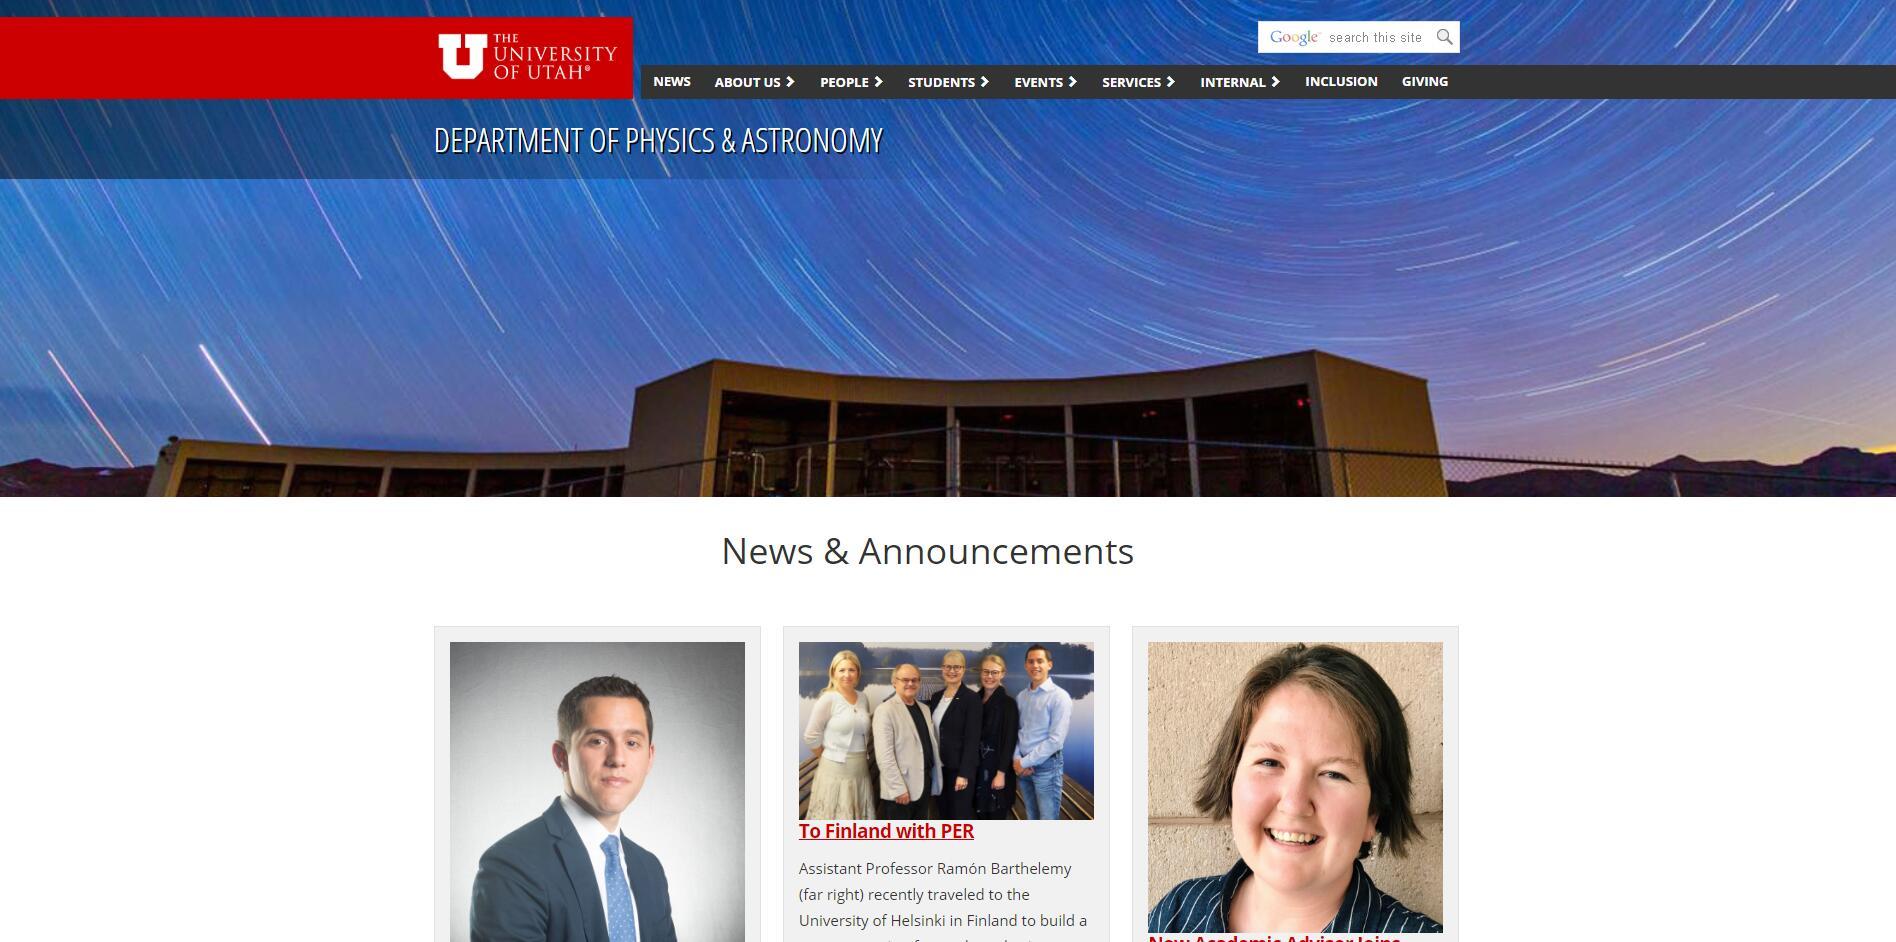 Top Physics Schools in Utah